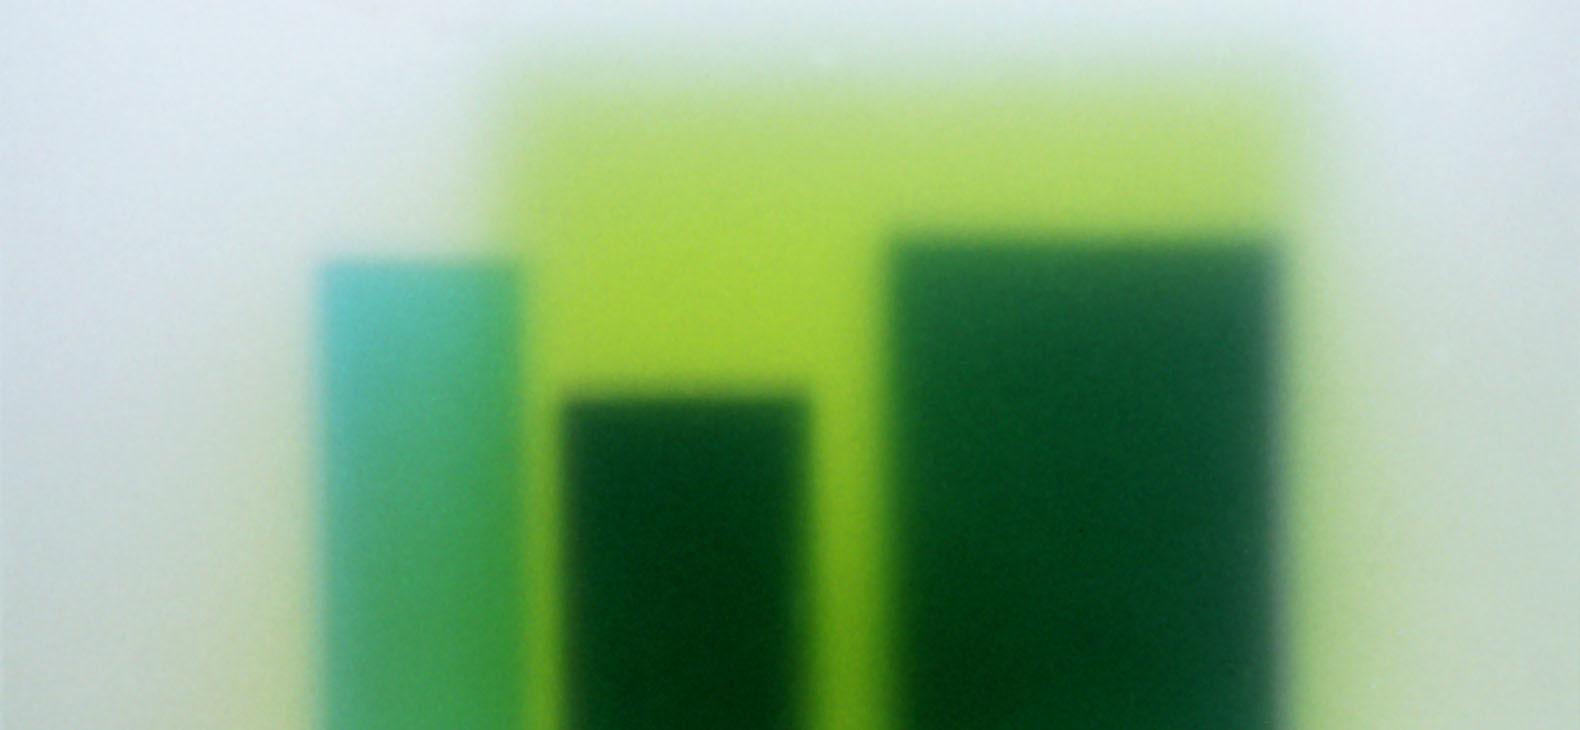 Fragile! - Ulrike Riede: Cube